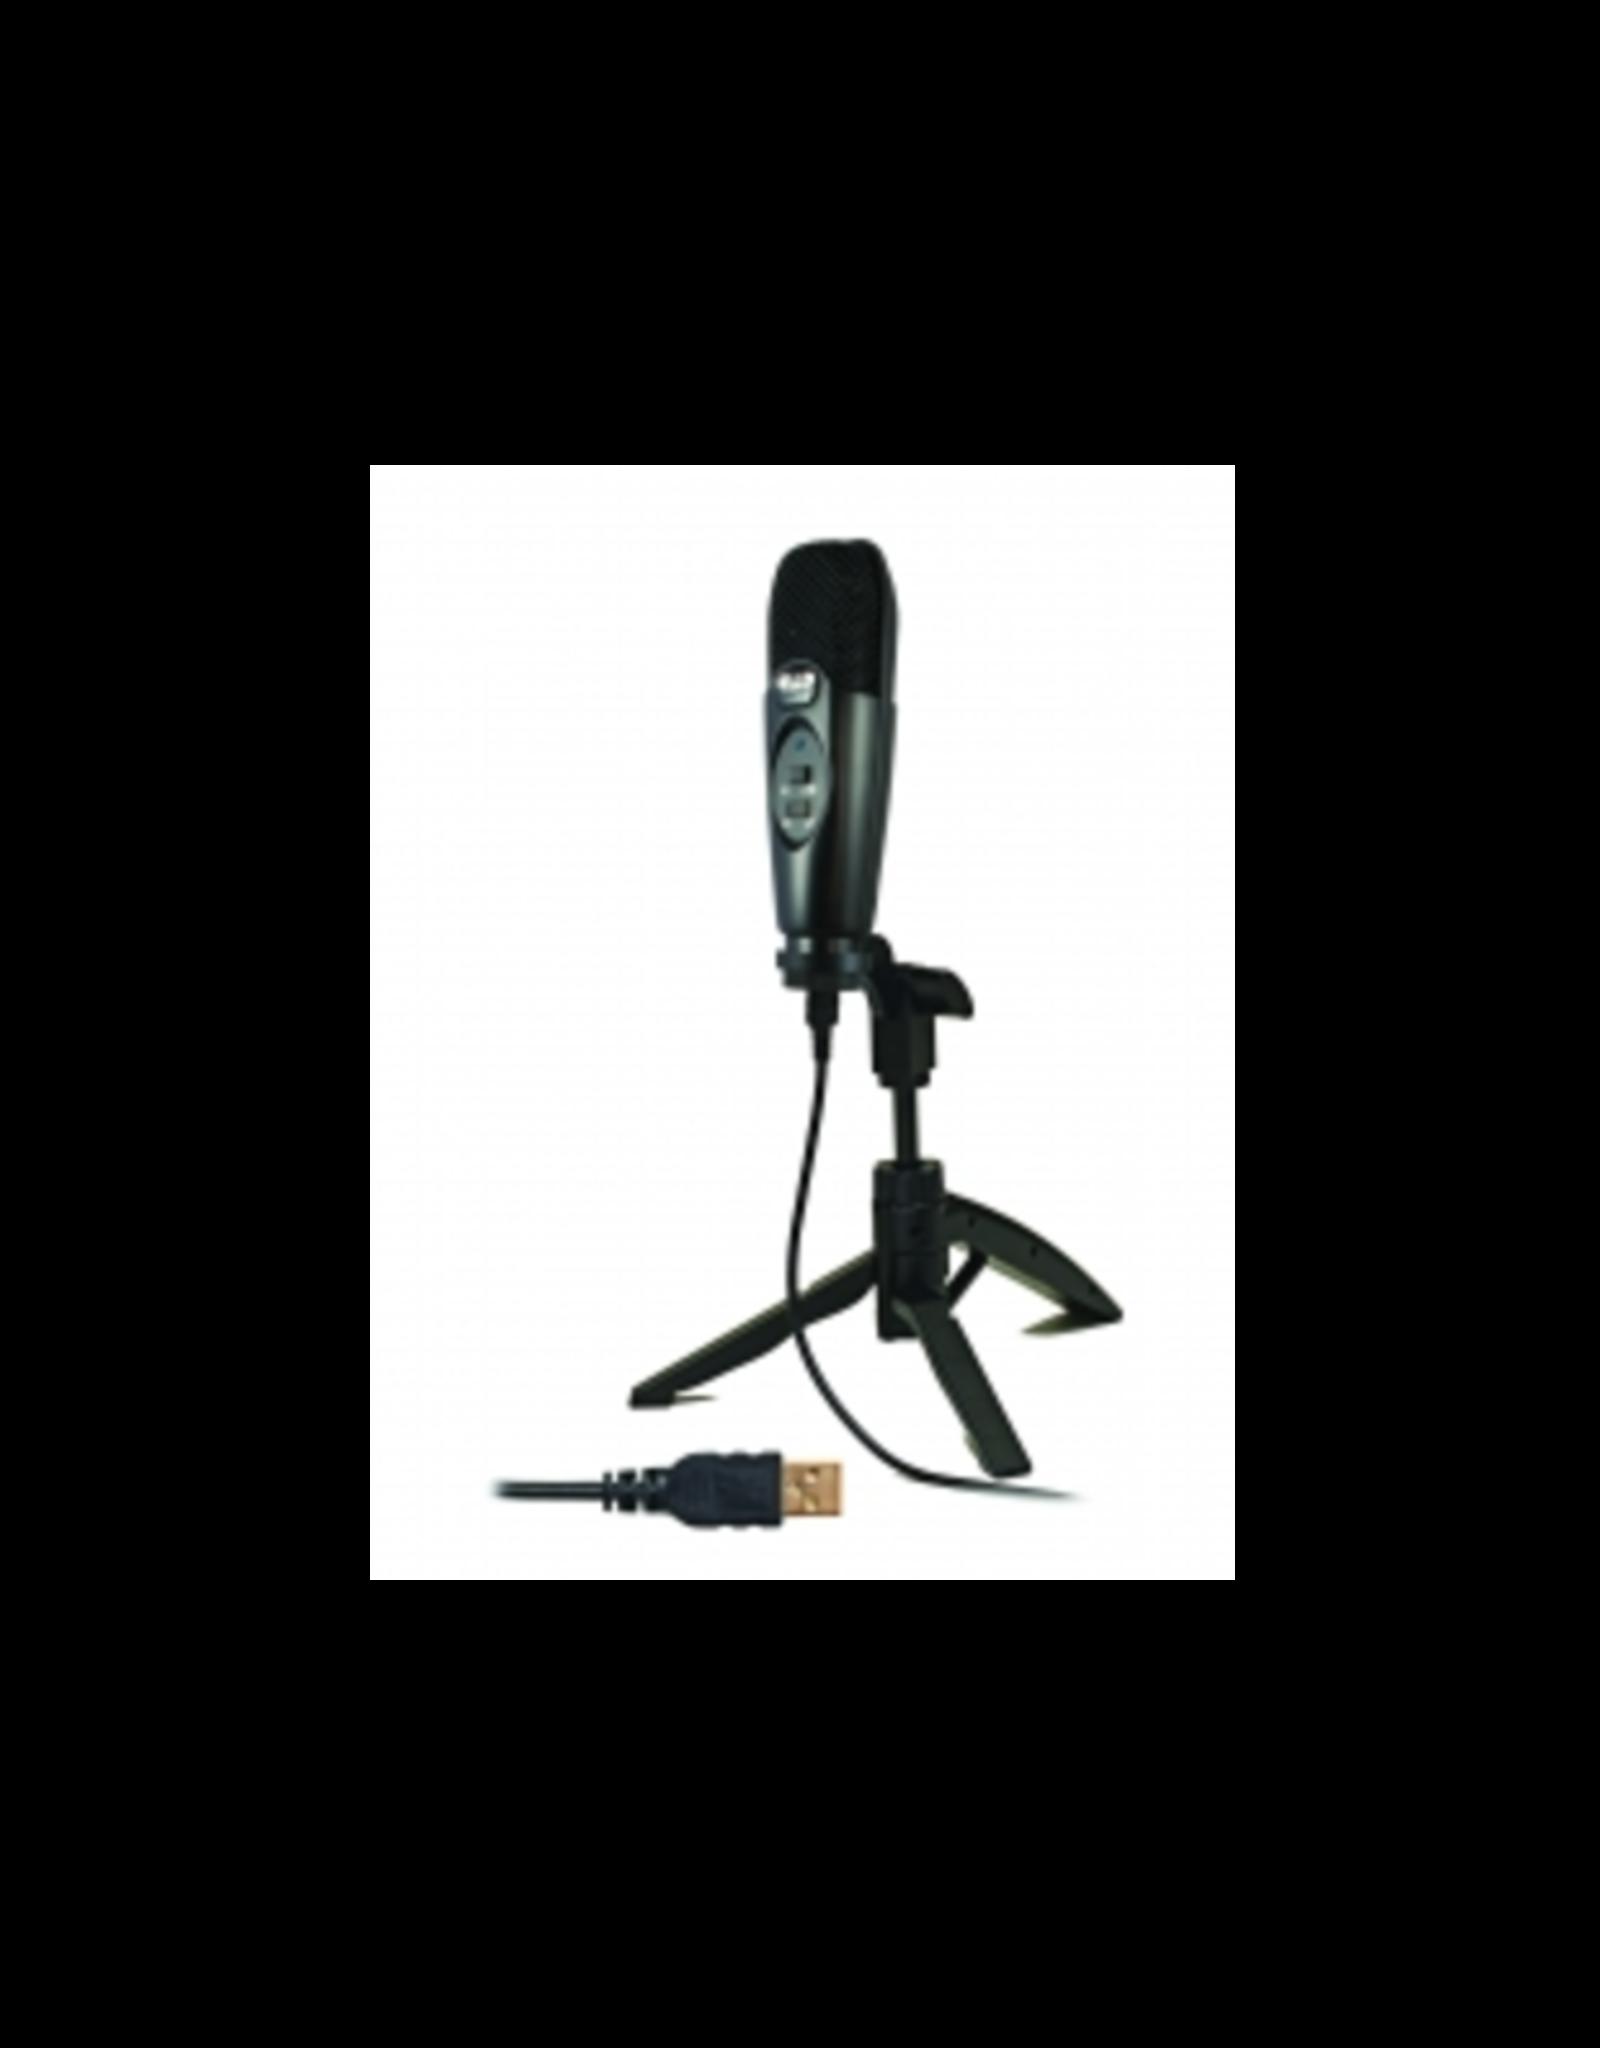 CAD CAD USB Large Diaphragm Cardioid Condenser Microphone w/Tripod Stand